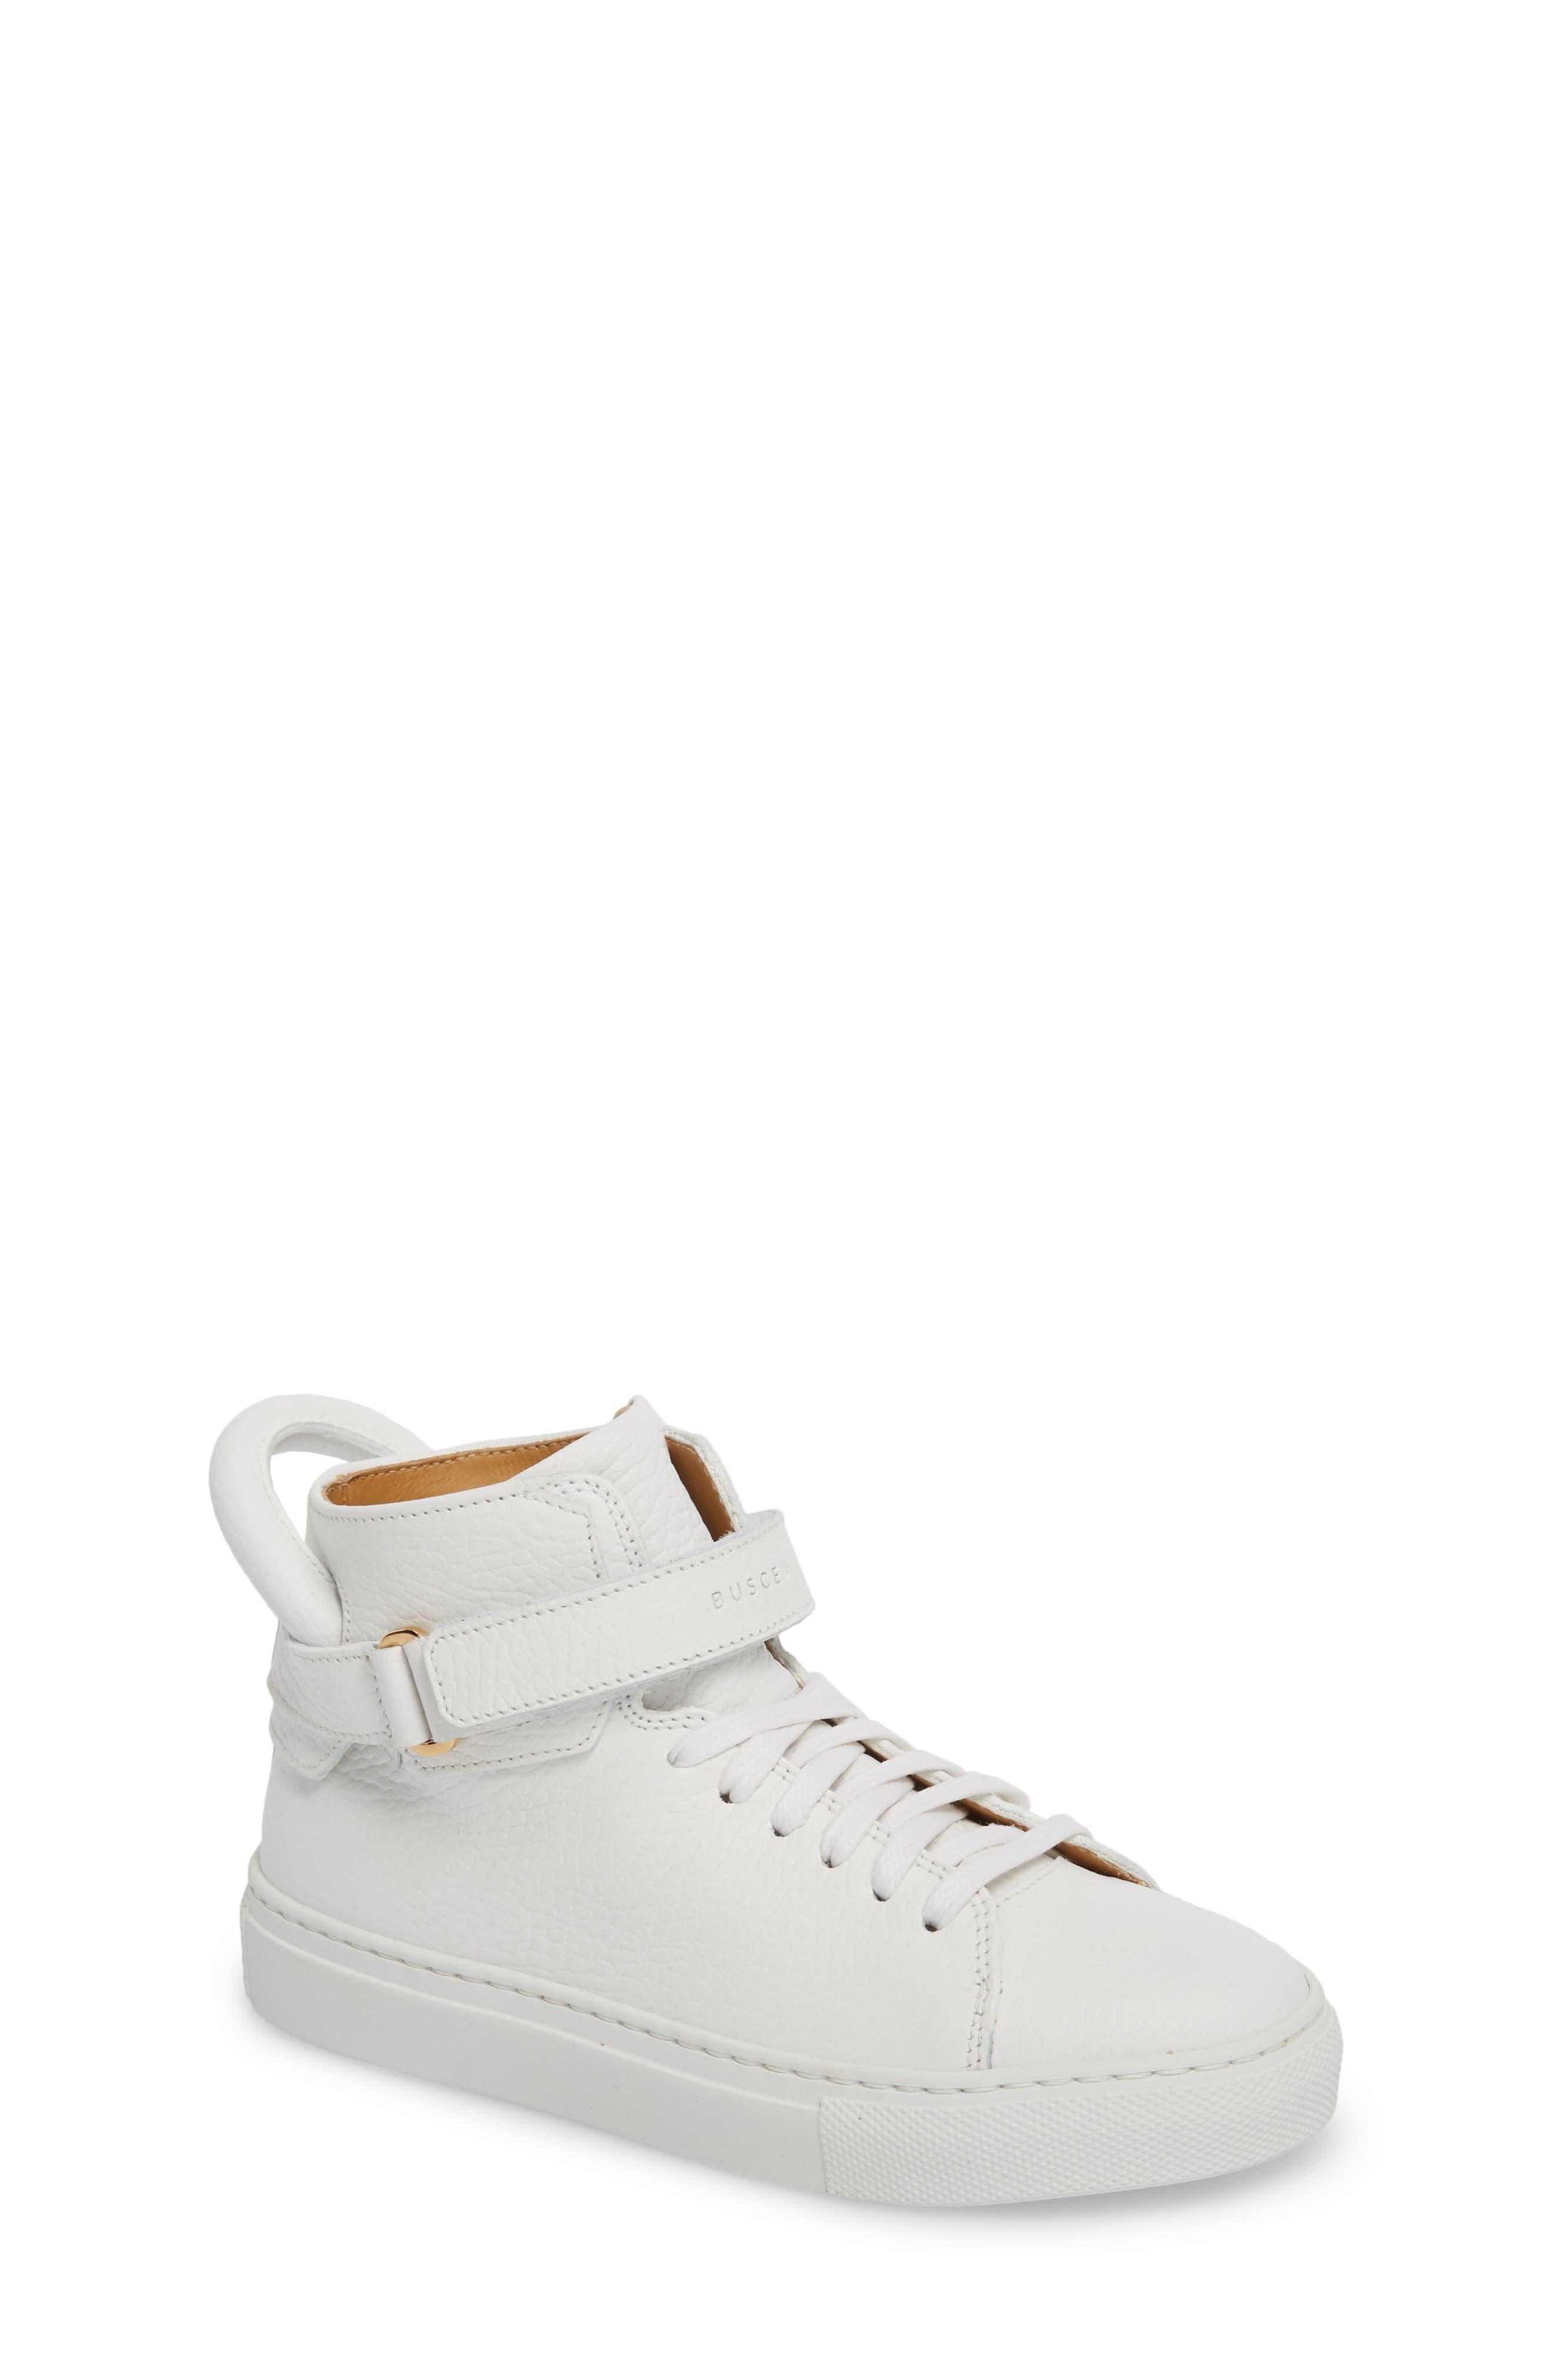 High Top Sneaker,                             Main thumbnail 1, color,                             100